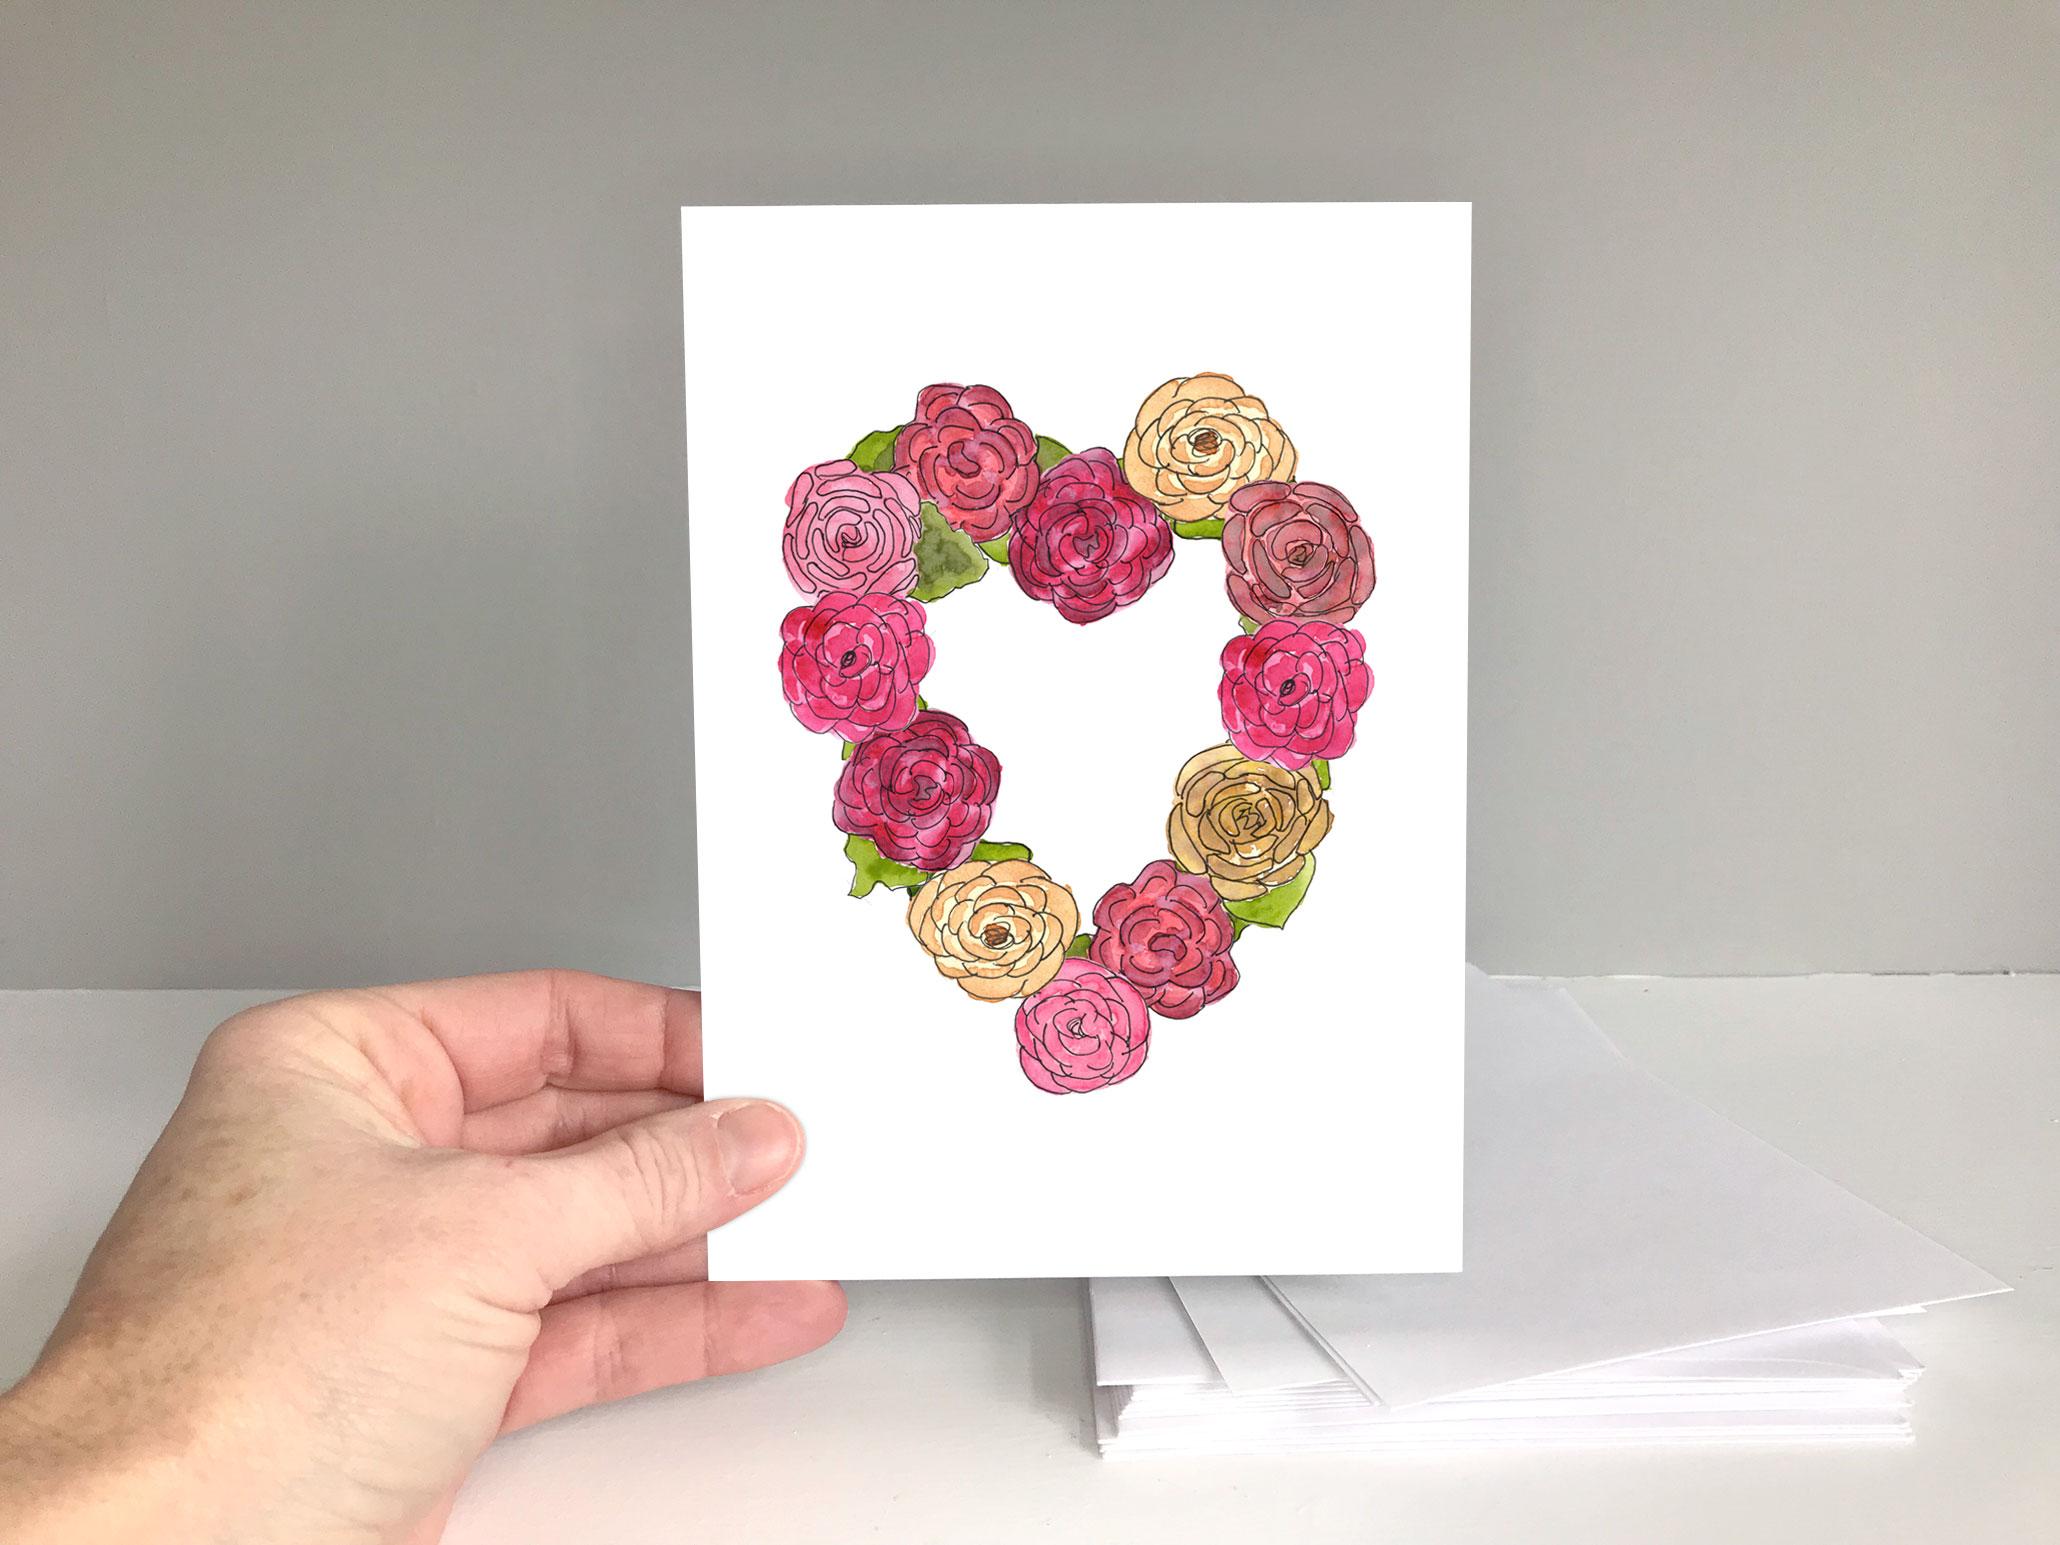 Watercolor Roses Heart Valentine's Day or Anniversary Card Digital Download on Etsy https://www.etsy.com/shop/EileenMcKennaArt